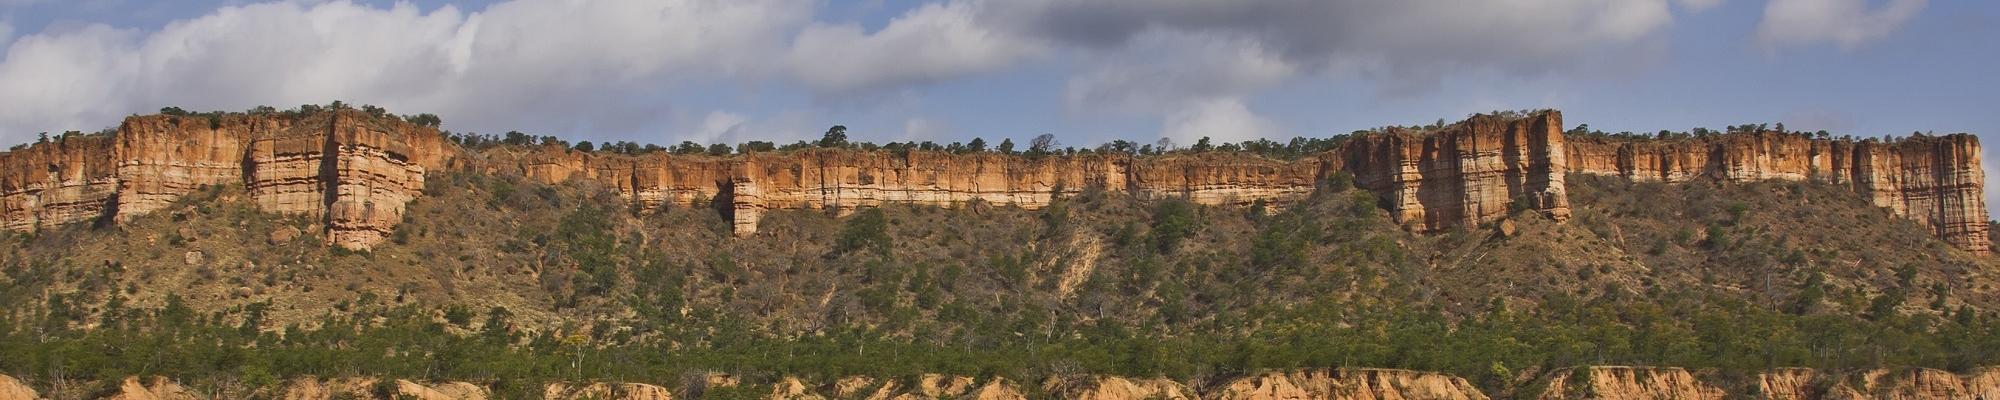 Gonarezhou parc Zimbabwe falaises de Chilogo